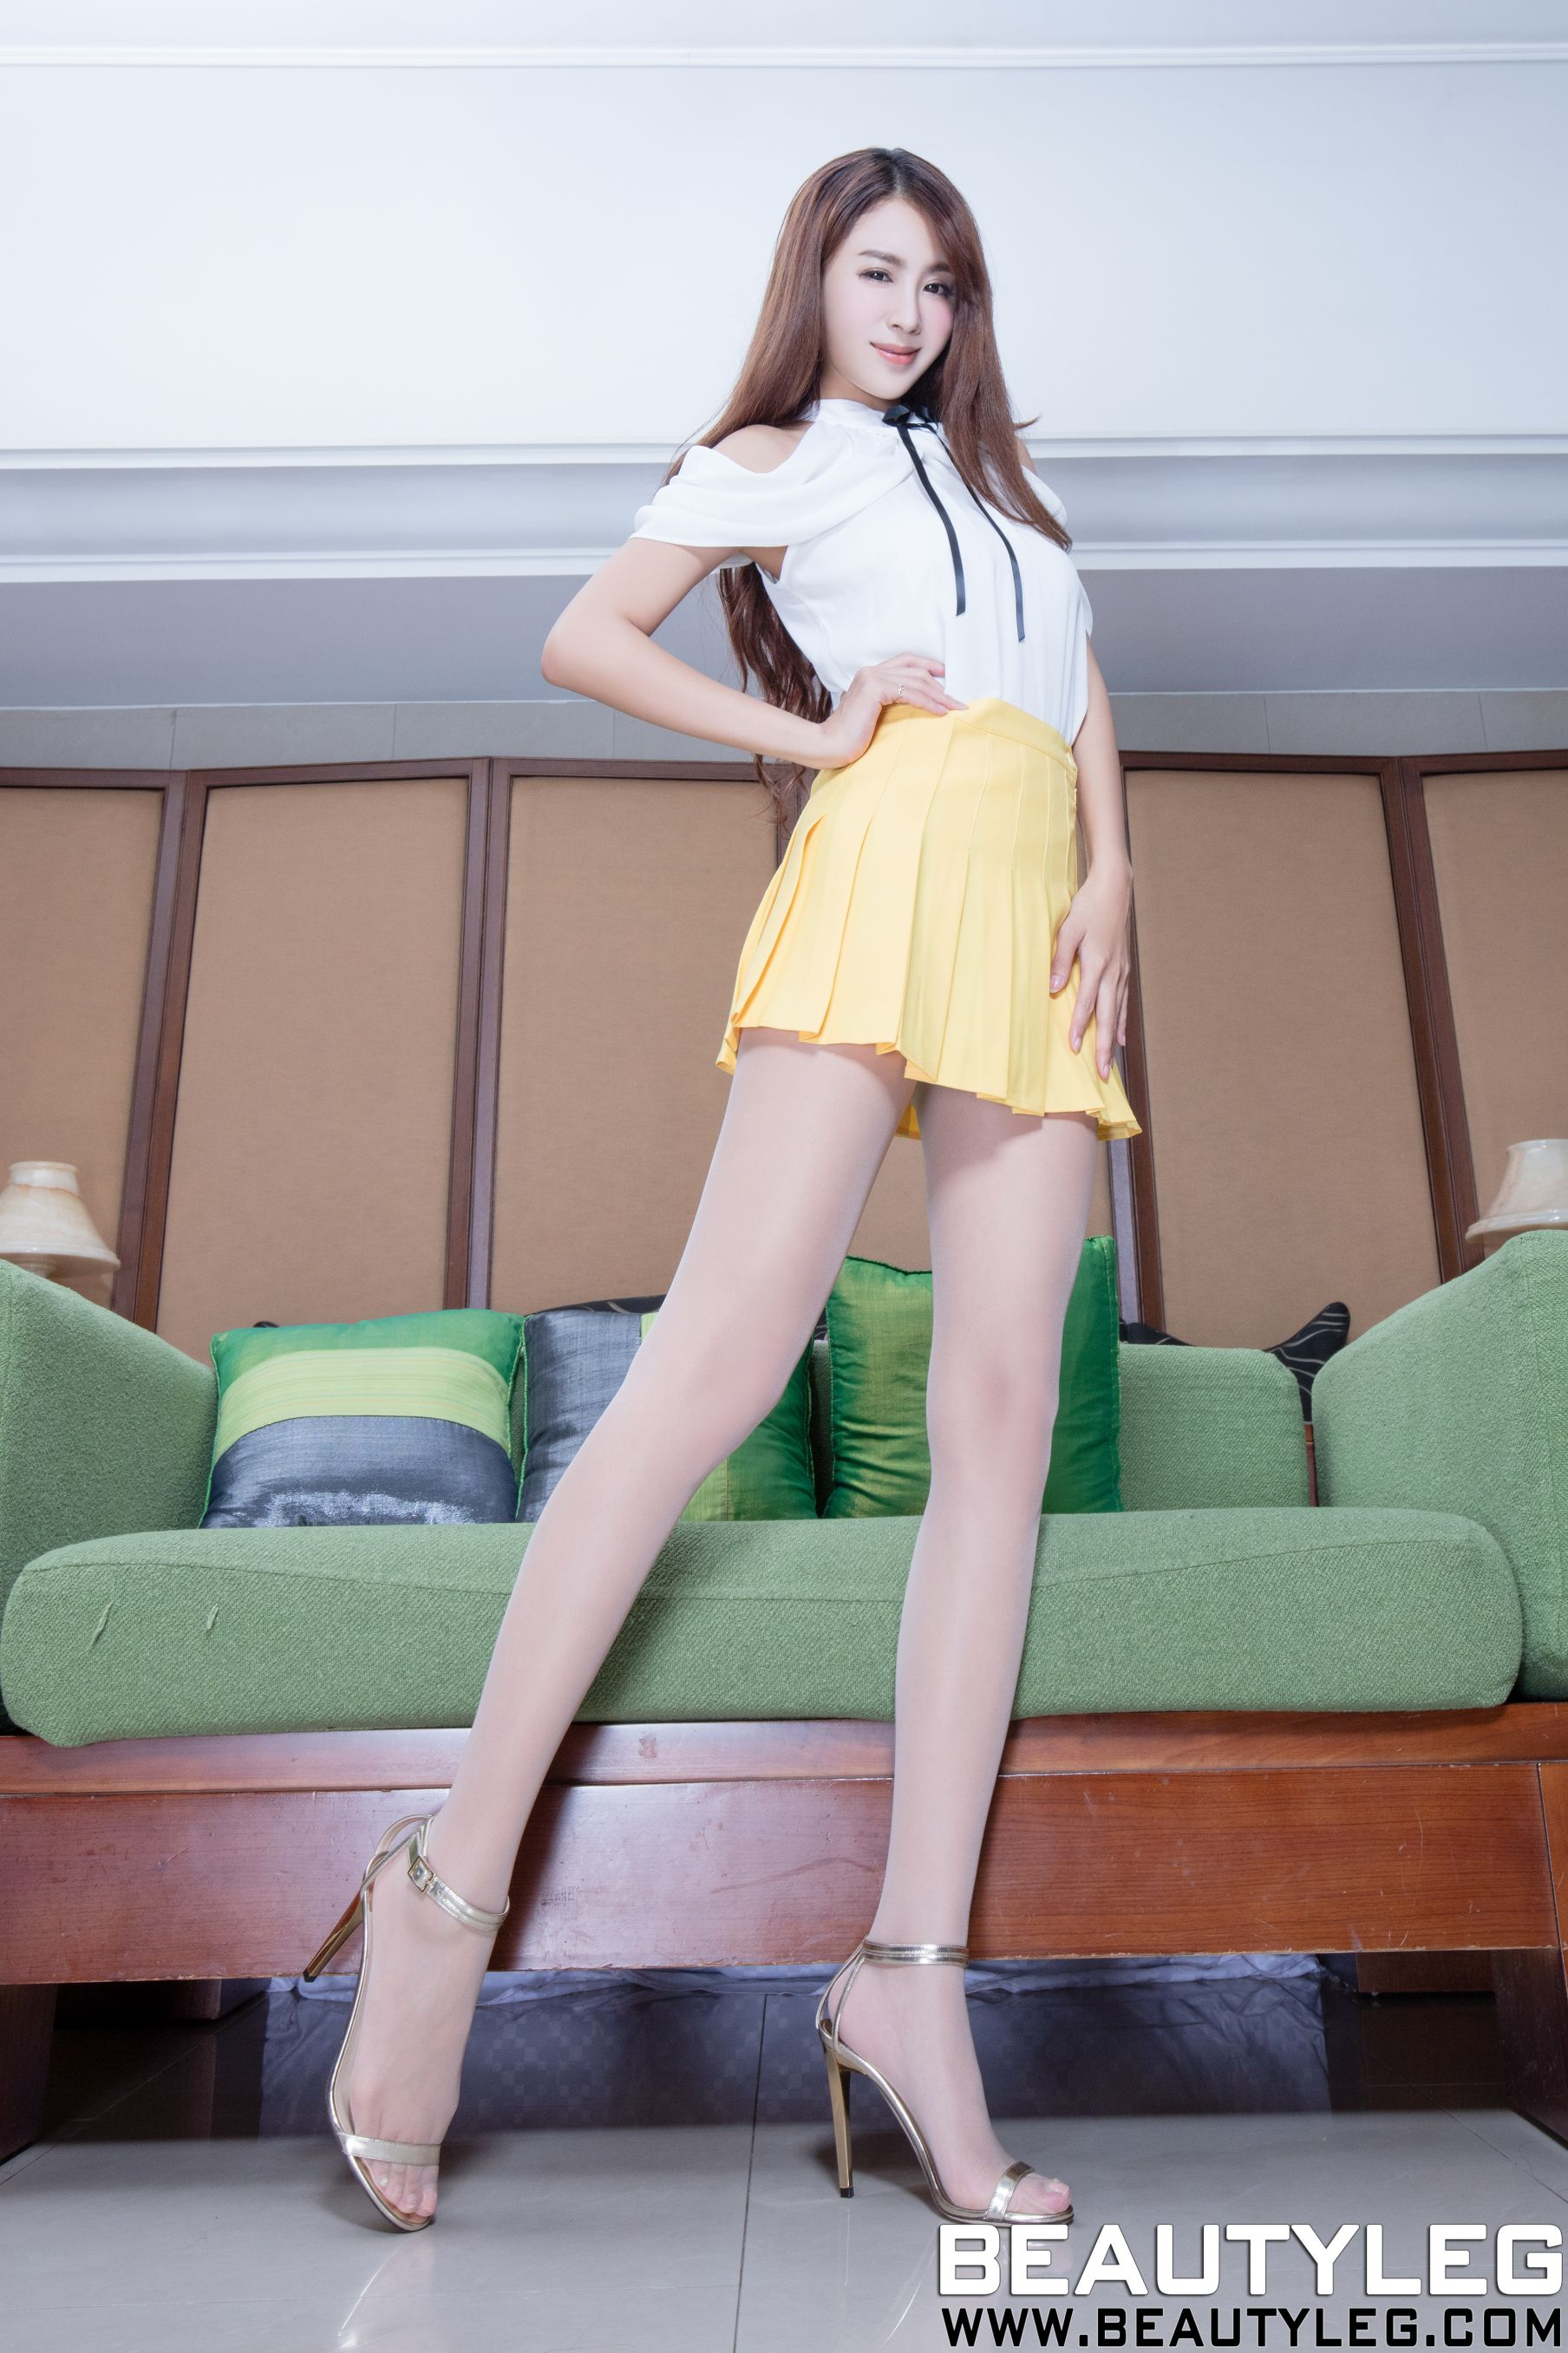 VOL.50 [Beautyleg]超短裙丝袜美腿:夏晴(夏晴Miso,腿模Miso)高品质写真套图(53P)